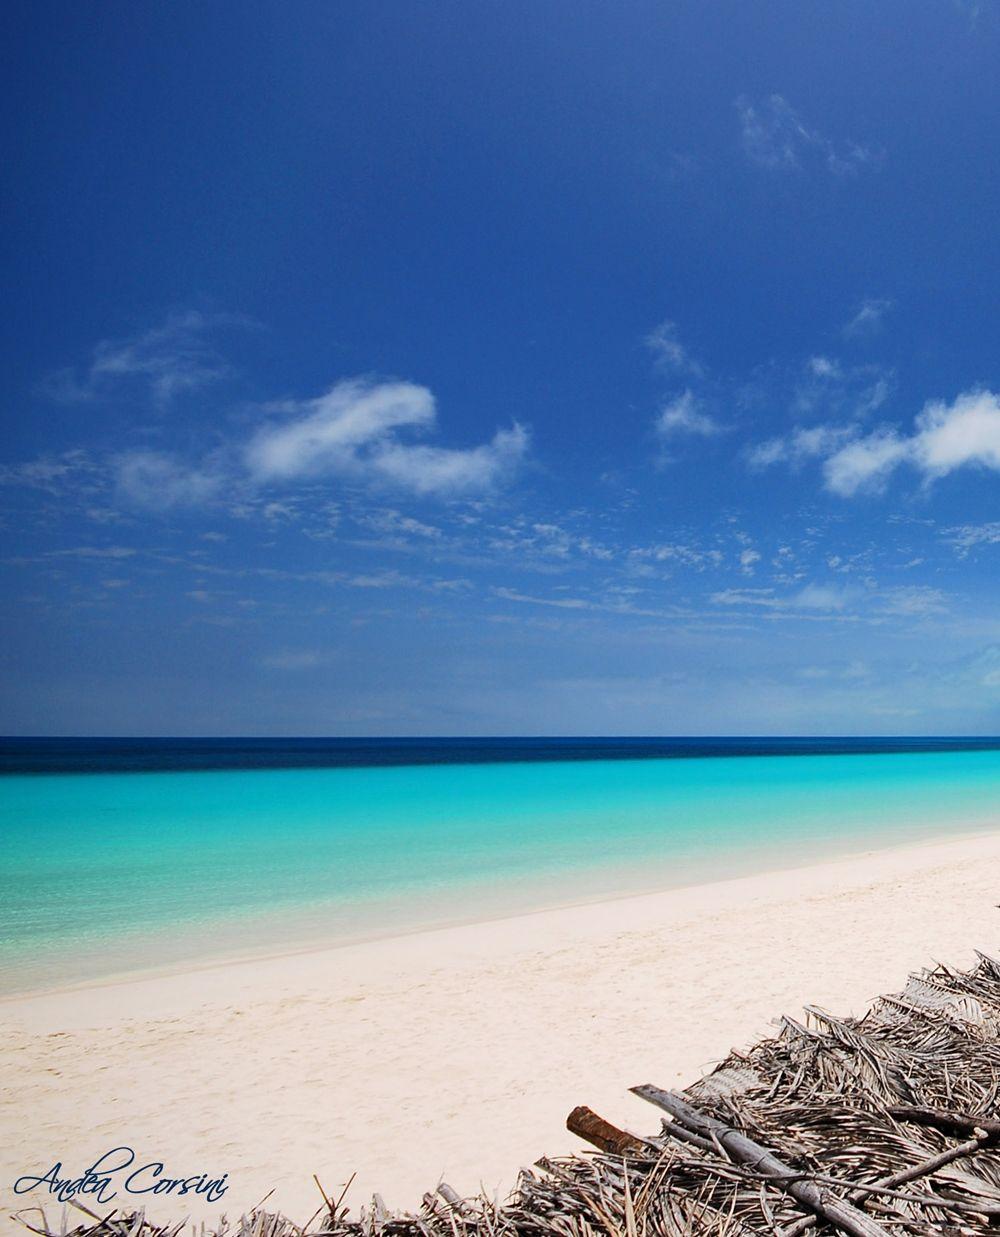 Mouli, Loyalty Islands, New Caledonia